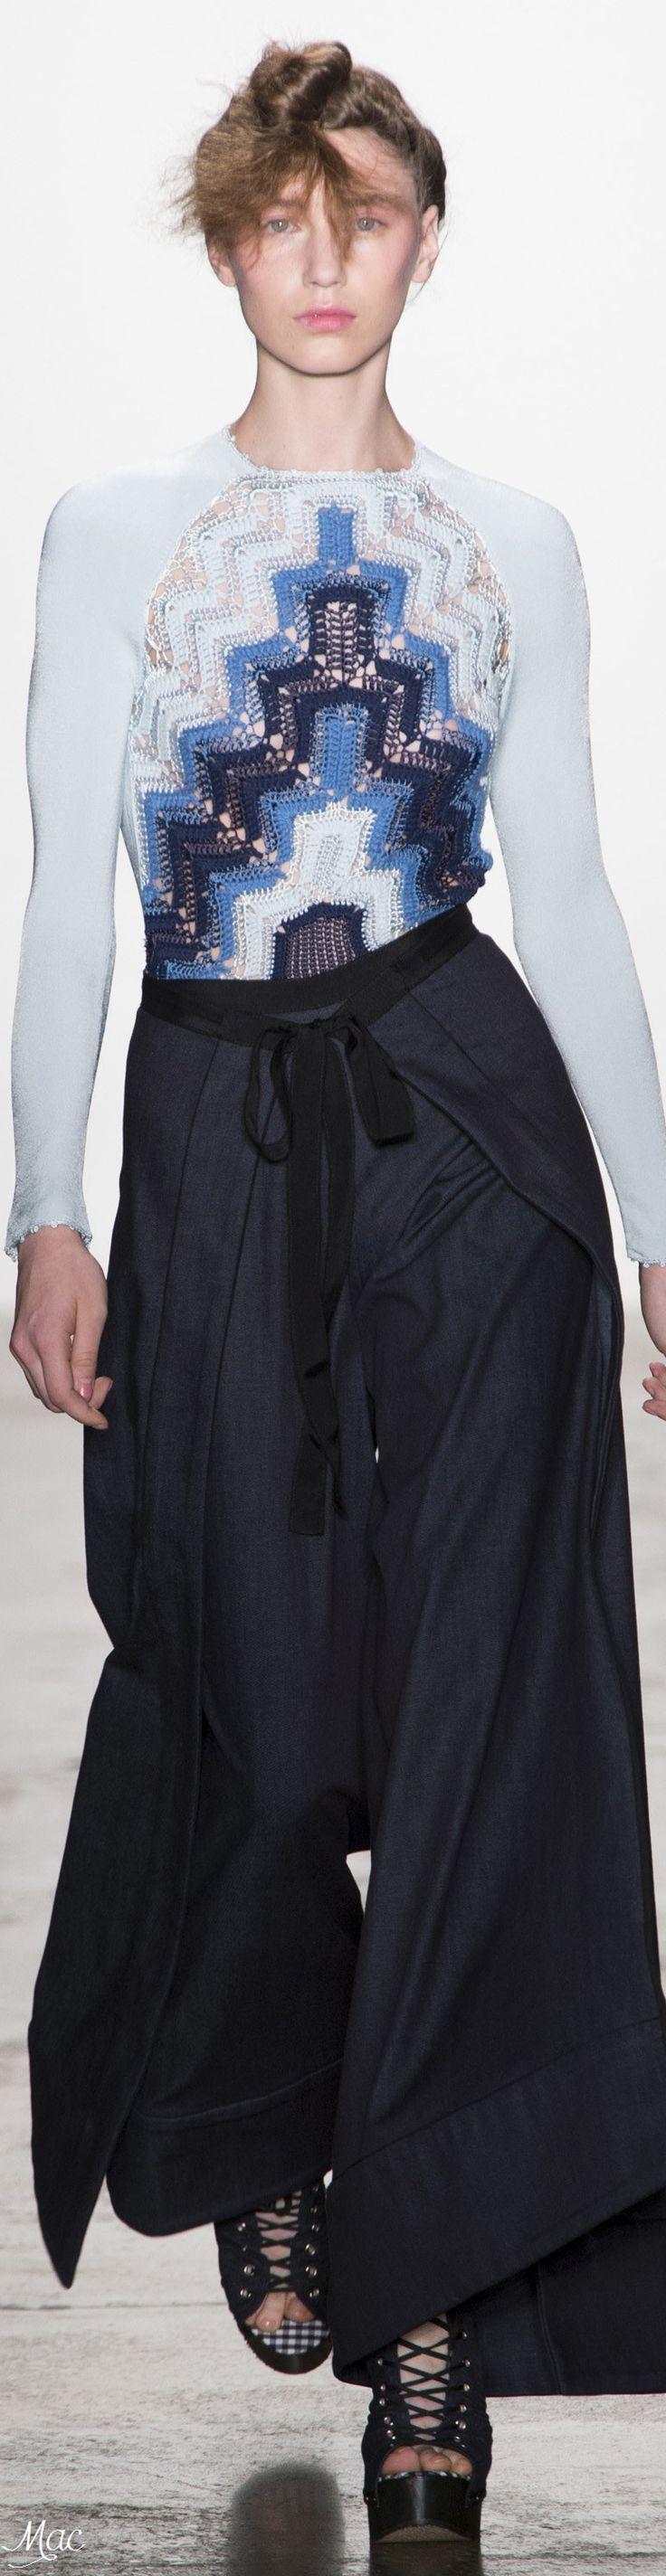 Spring 2017 Ready-to-Wear Adam Selman